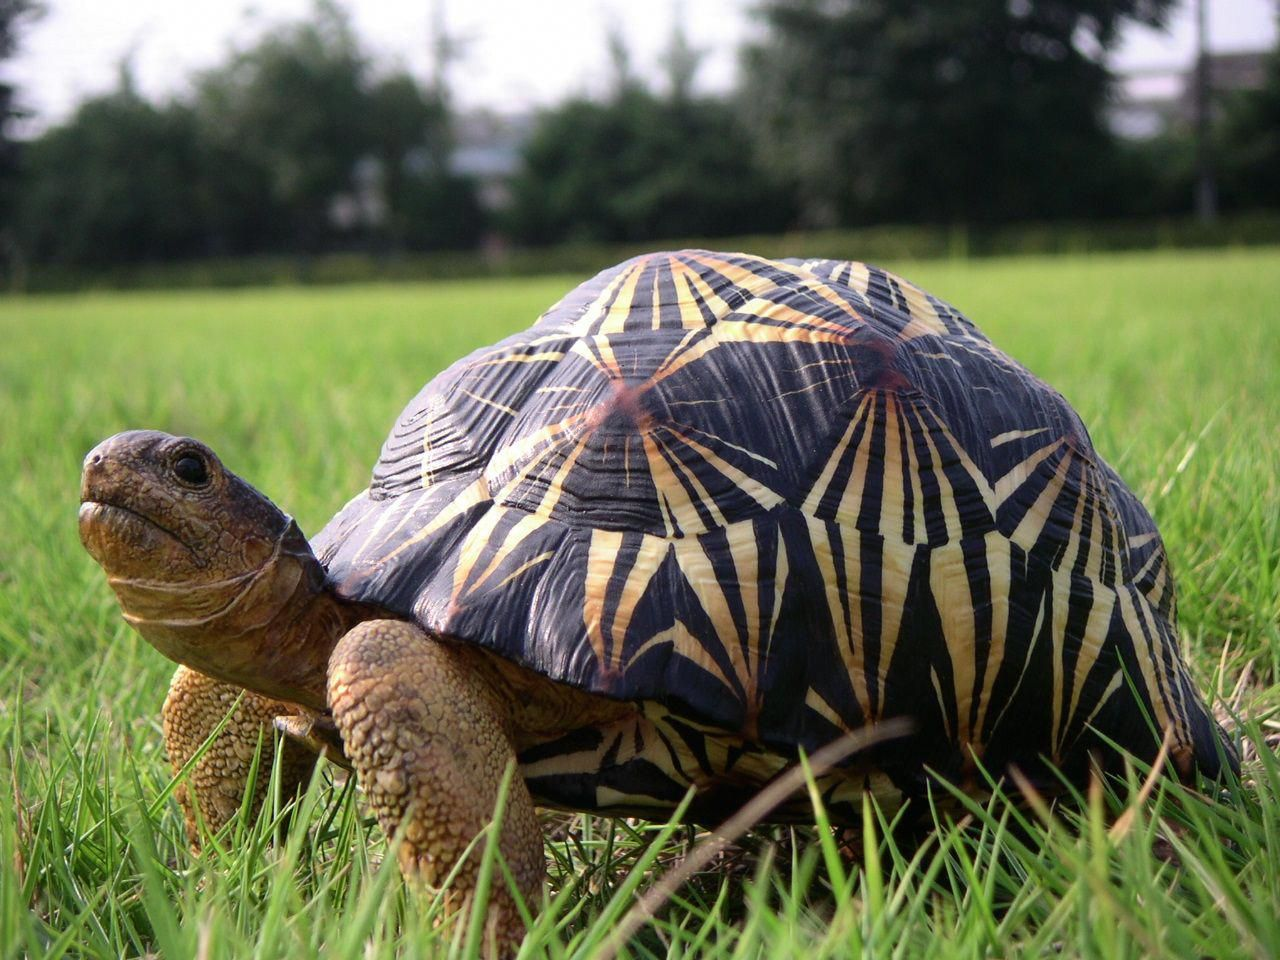 Adorable radiated tortoise radiated tortoise tortoises